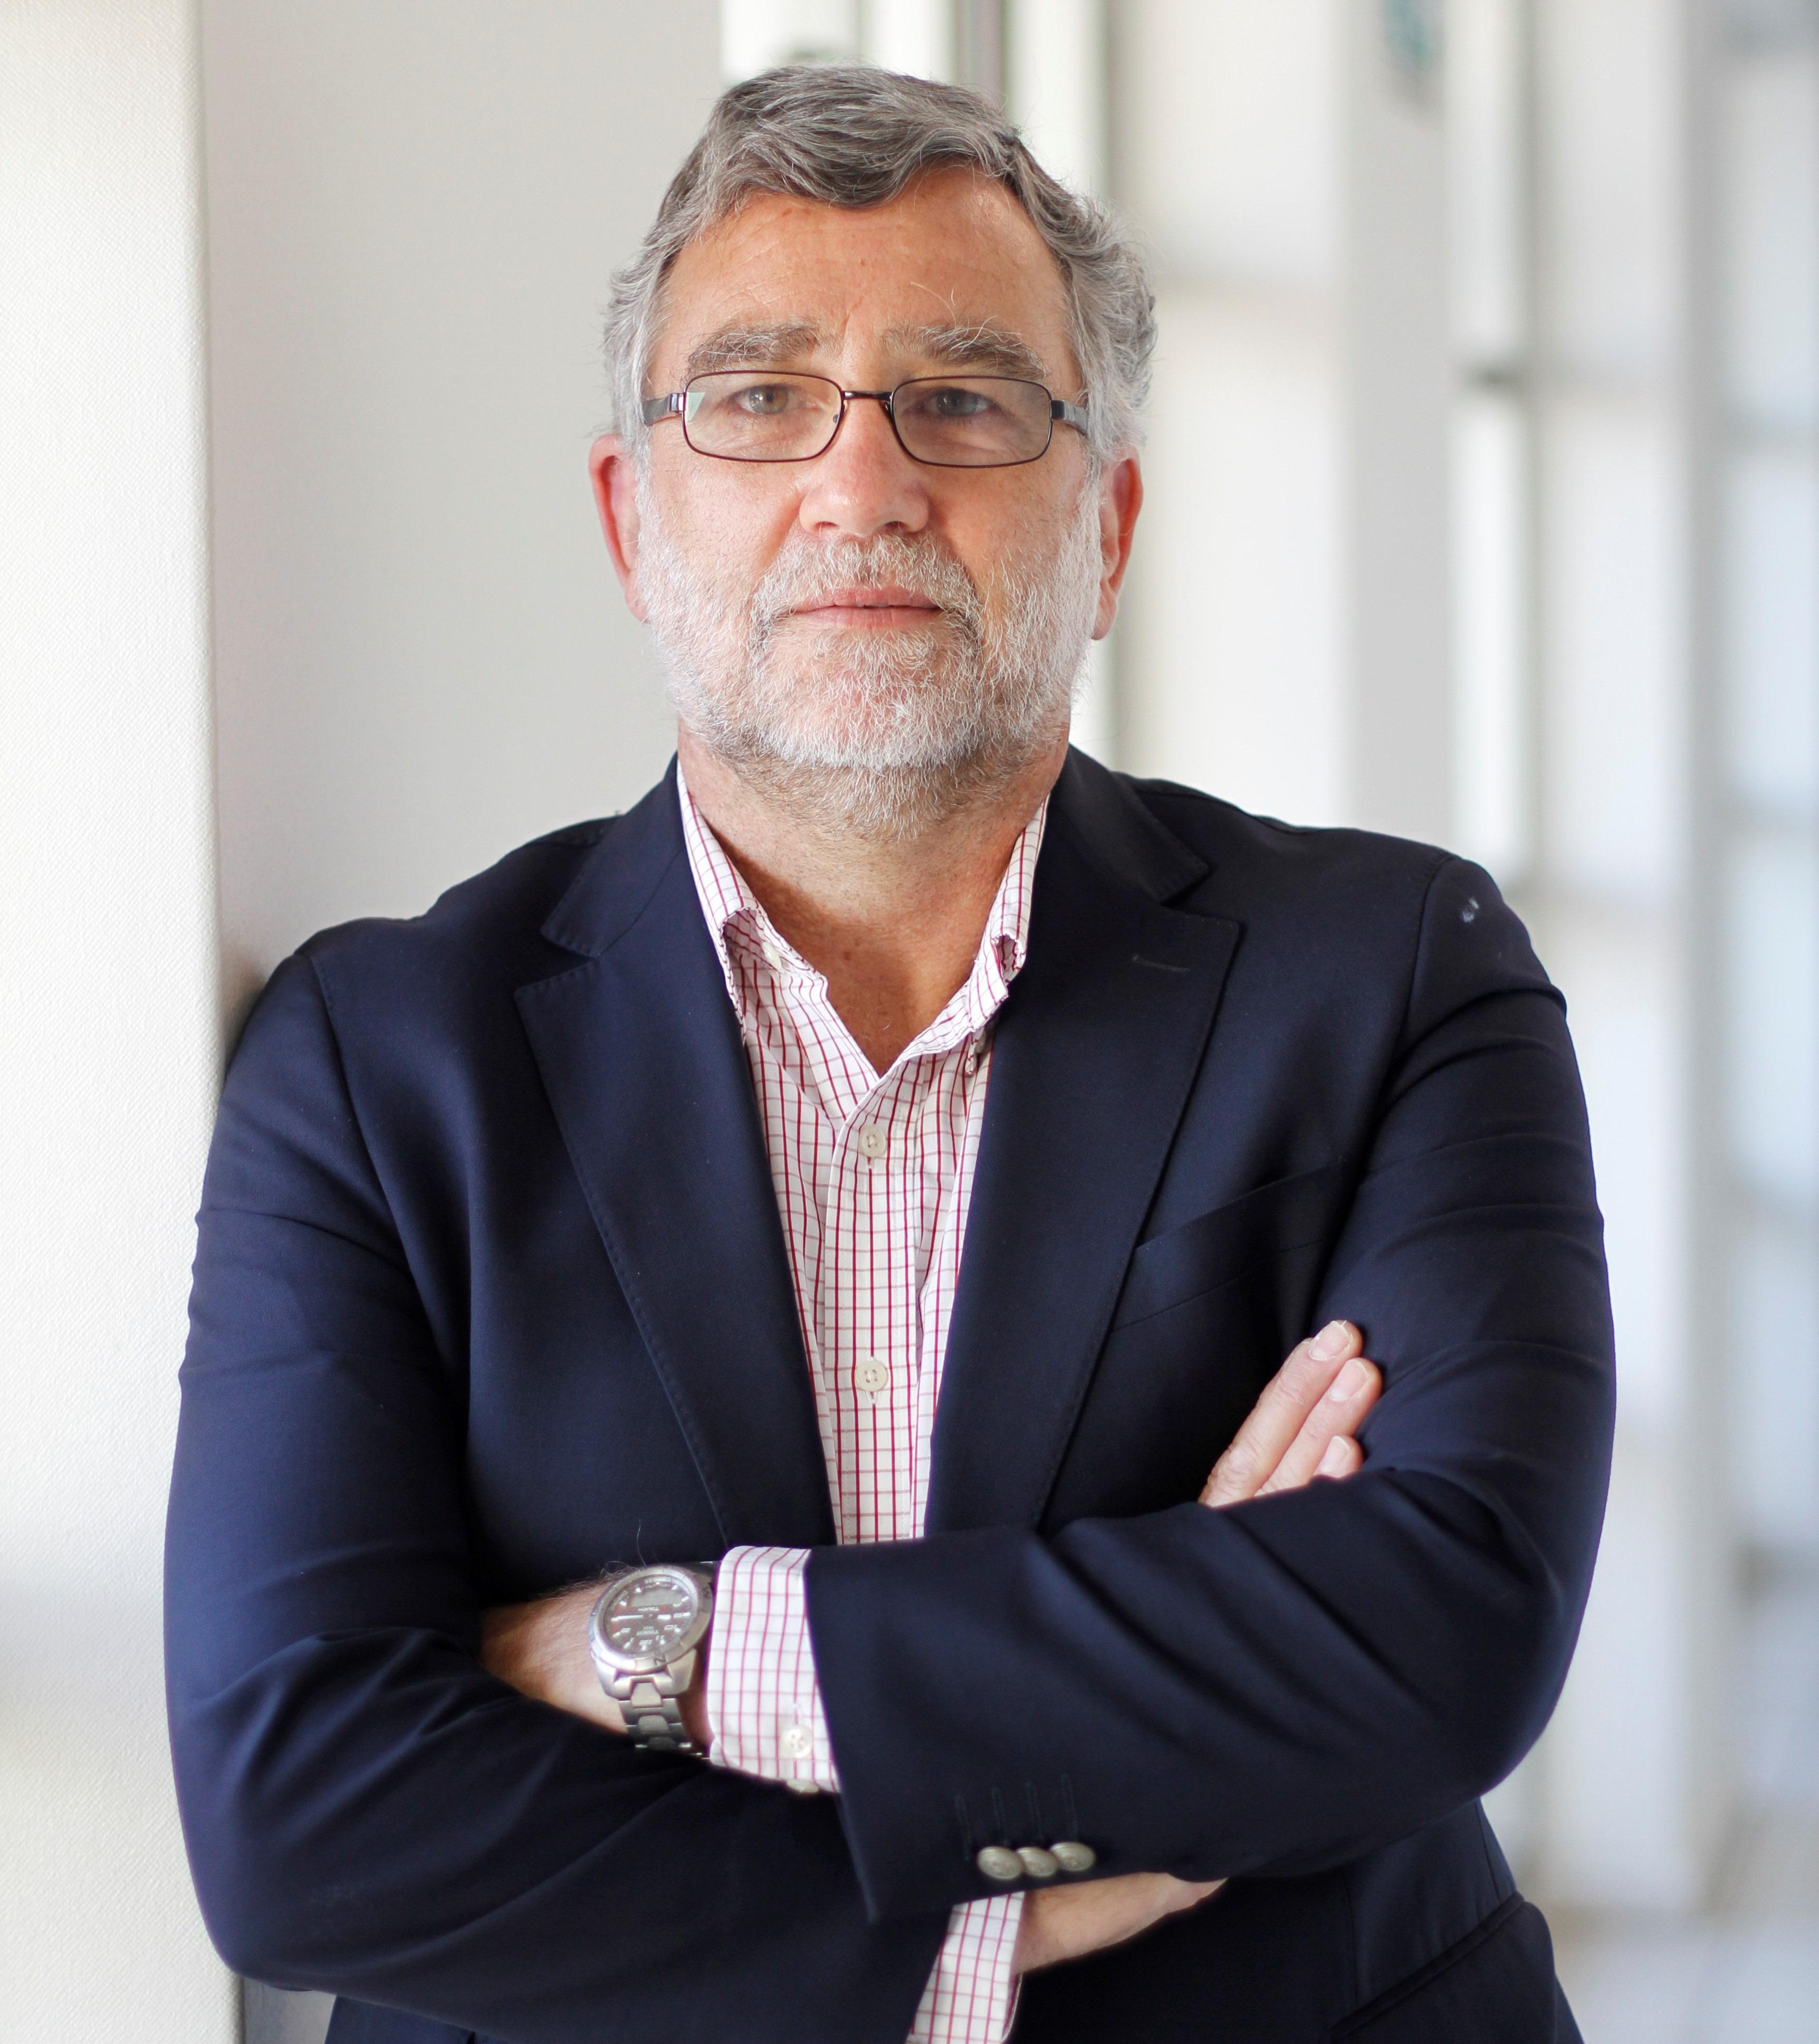 José Luis Widow